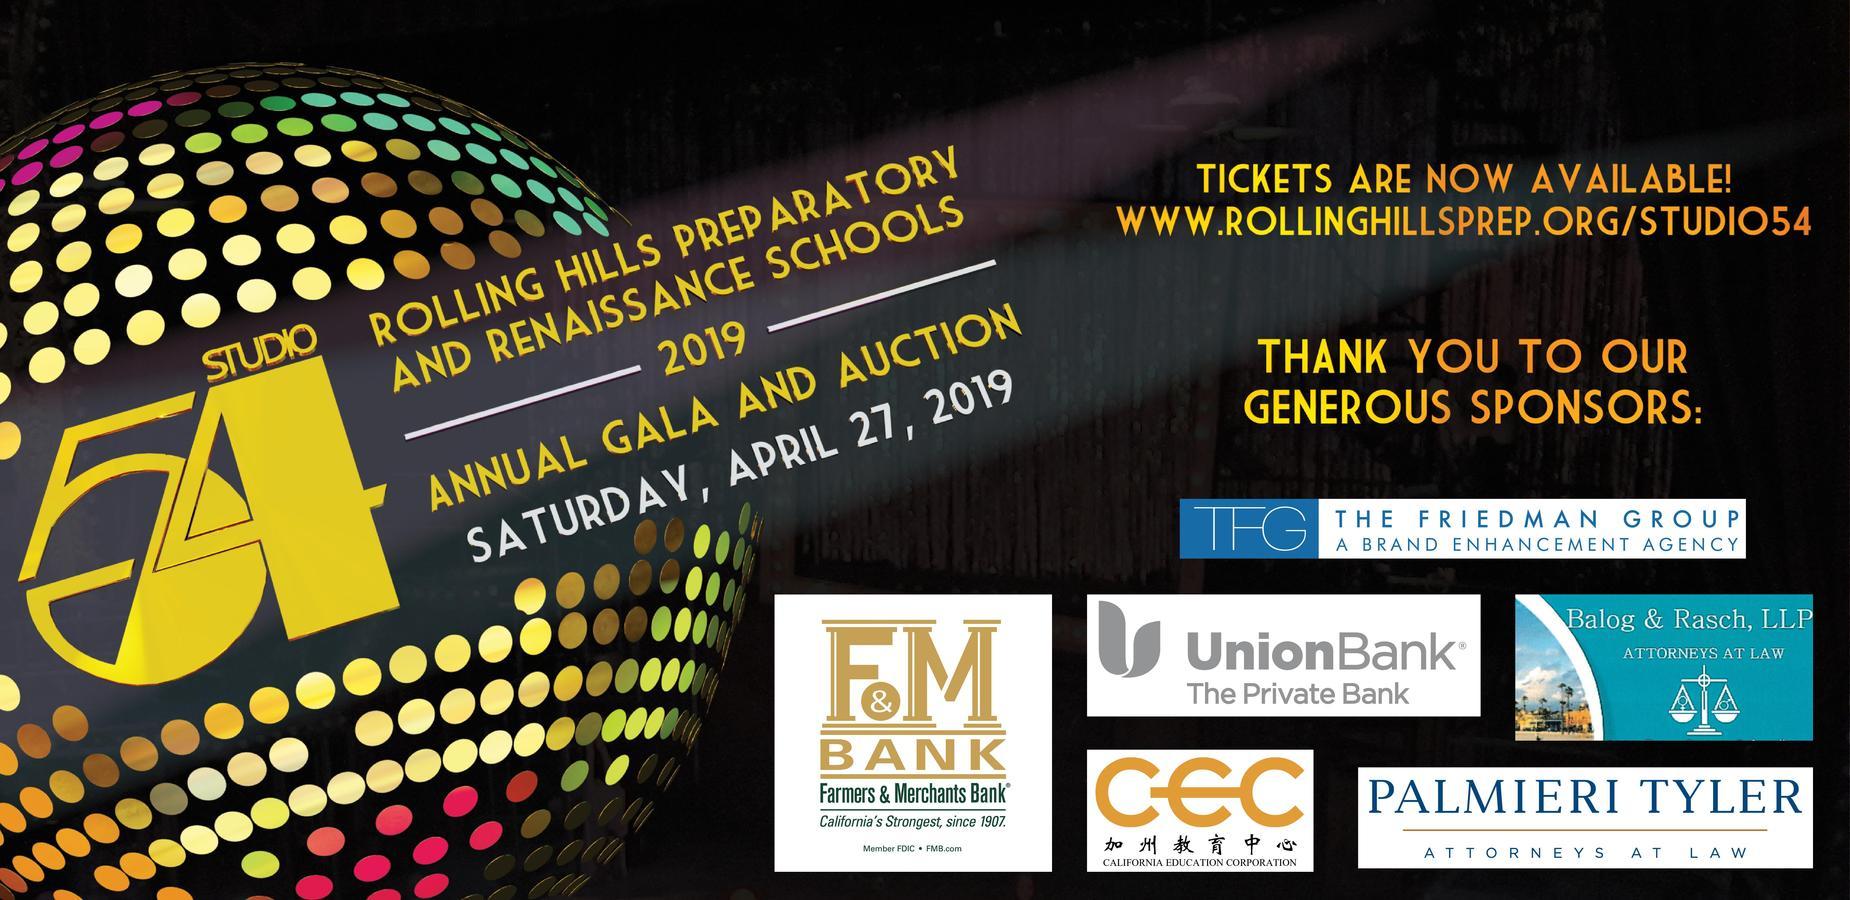 Studio 54 Gala Banner - April 27, 2019, Crowne Plaza Redondo Beach. For more information, visit RollingHillsPrep.org/studio54